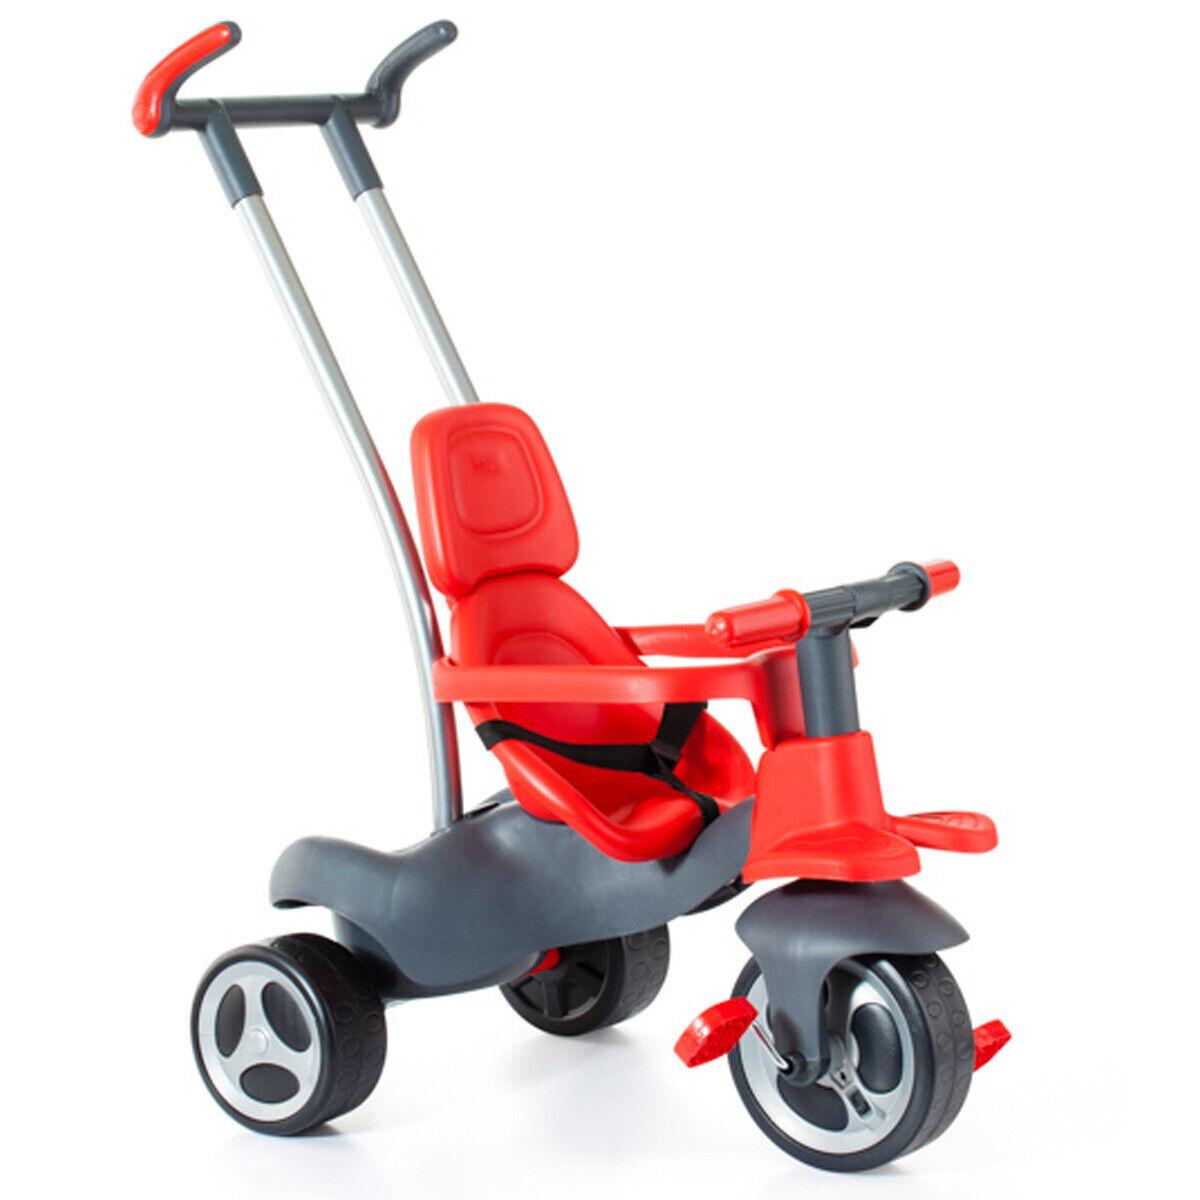 Baby Dreirad ab 10 Monaten Kinderdreirad Kinderfahrzeug Kinder Fahrzeug Rutscher